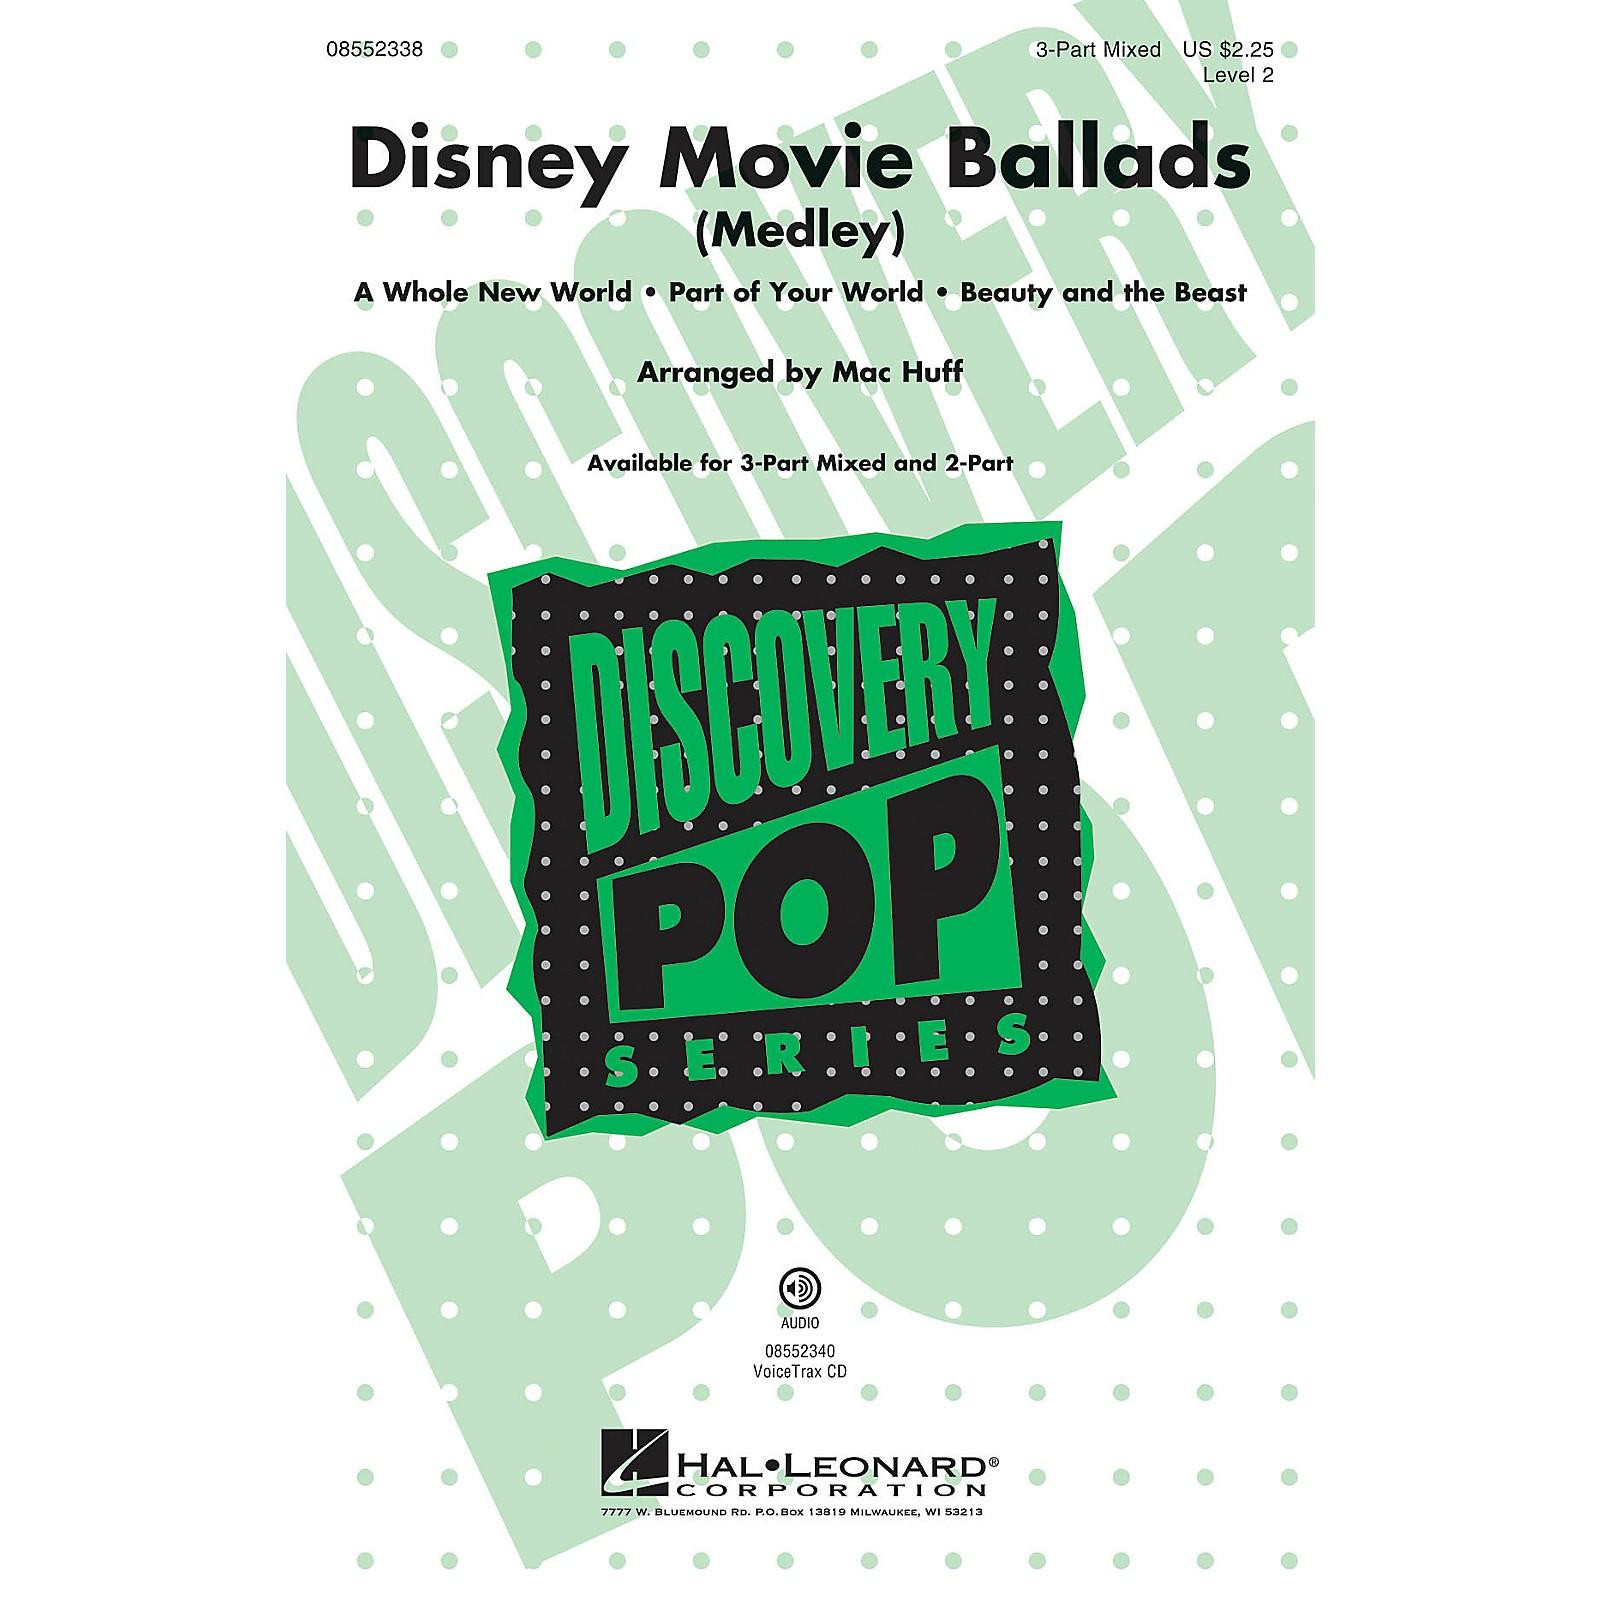 Hal Leonard Disney Movie Ballads (Medley) Discovery Level 2 3-Part Mixed arranged by Mac Huff